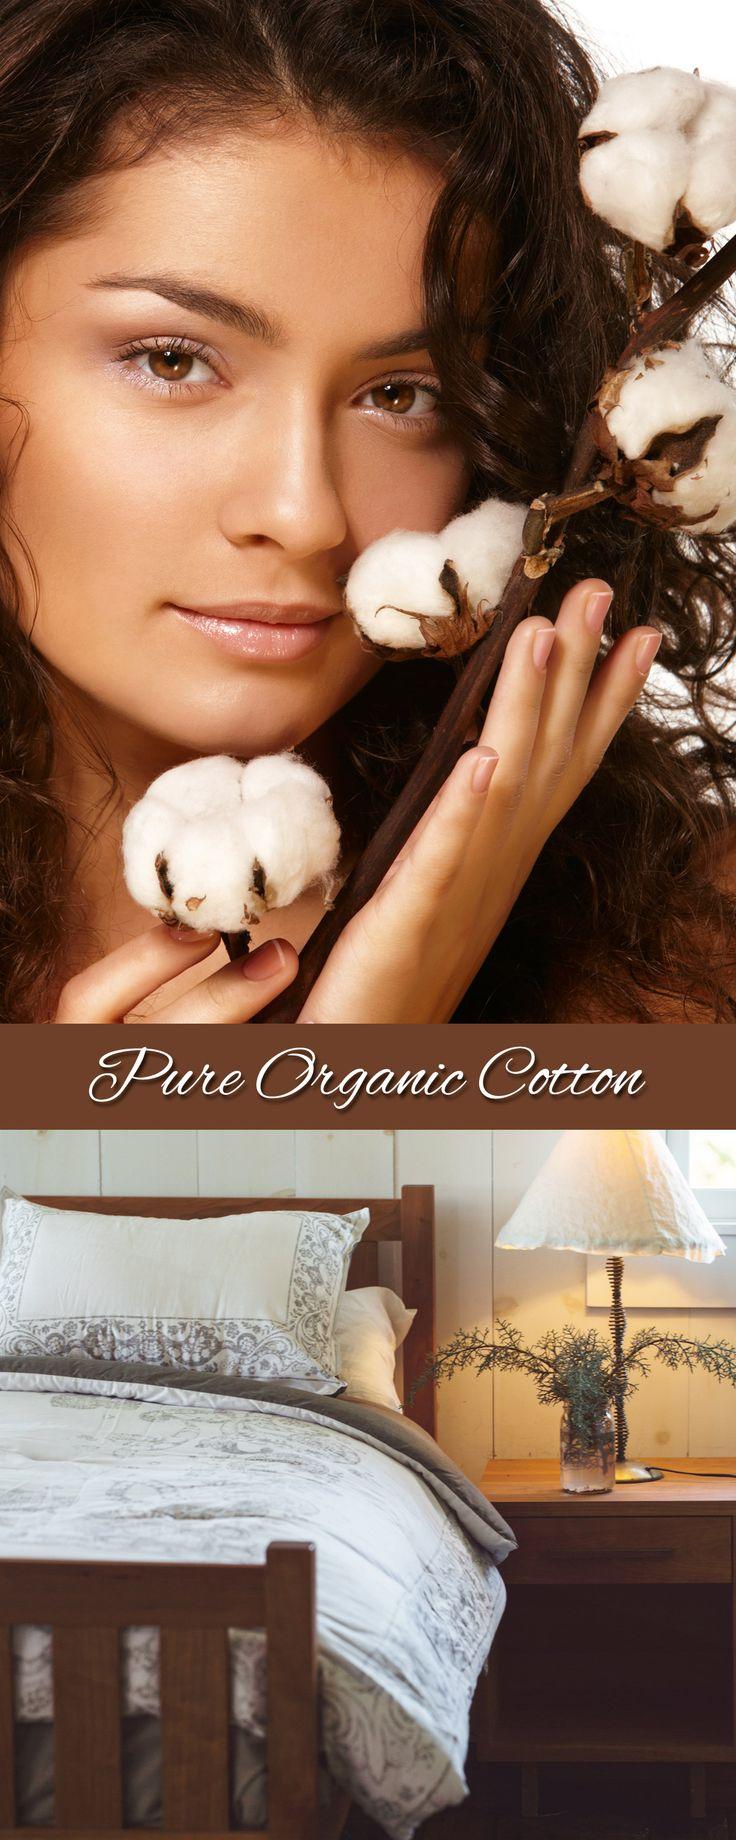 Organic Cotton Futon Mattress - Natural Futon Mattress made exclusively by The Futon Shop